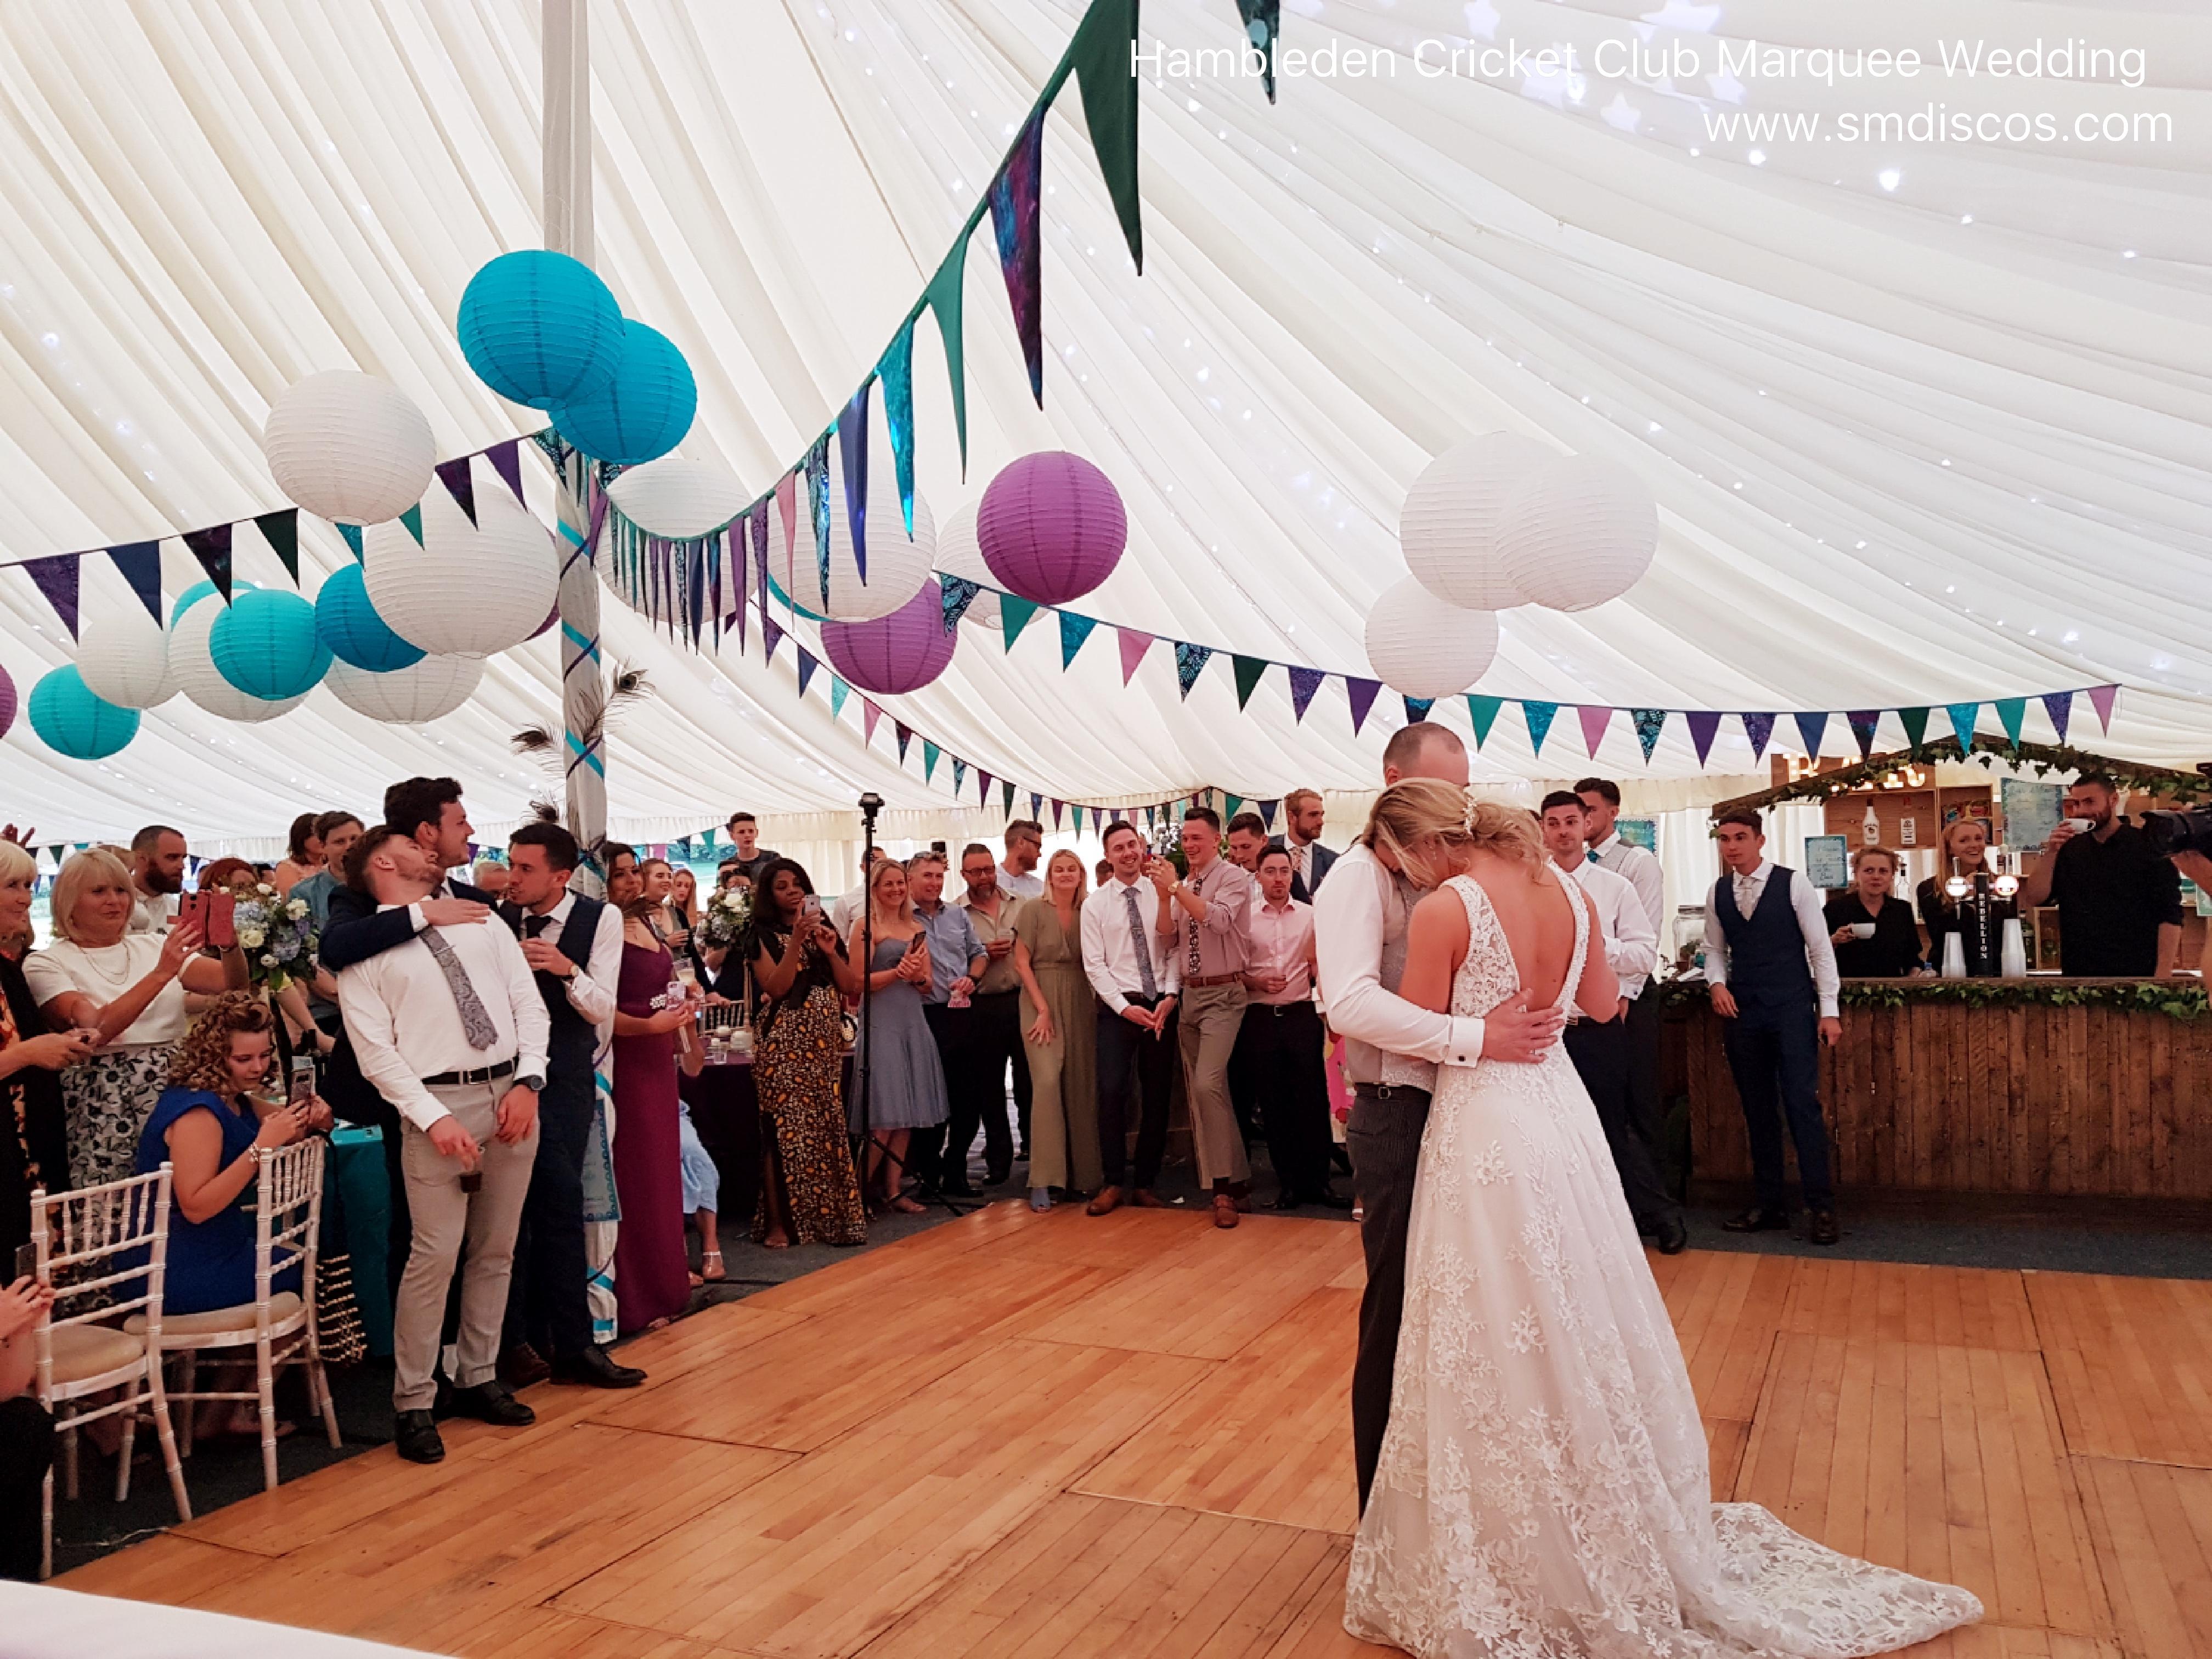 Hambleden Cricket Club First dance